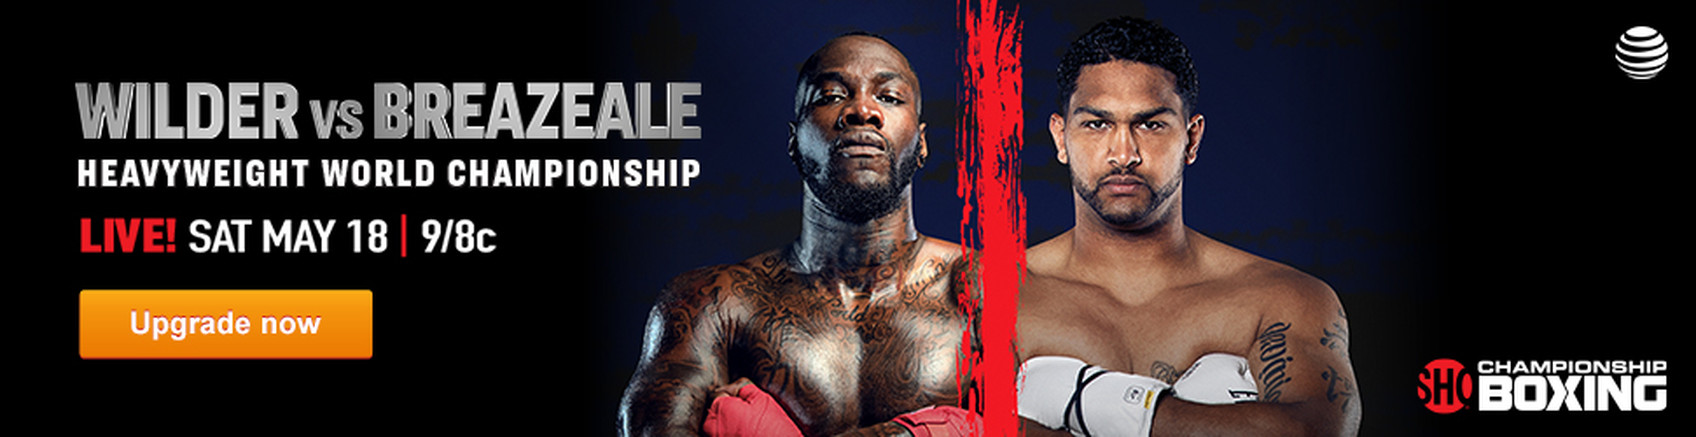 STU-1844_SHOWTIME_Boxing_Wilder_vs_Breazeale_InlineHubAd_970x250.jpg